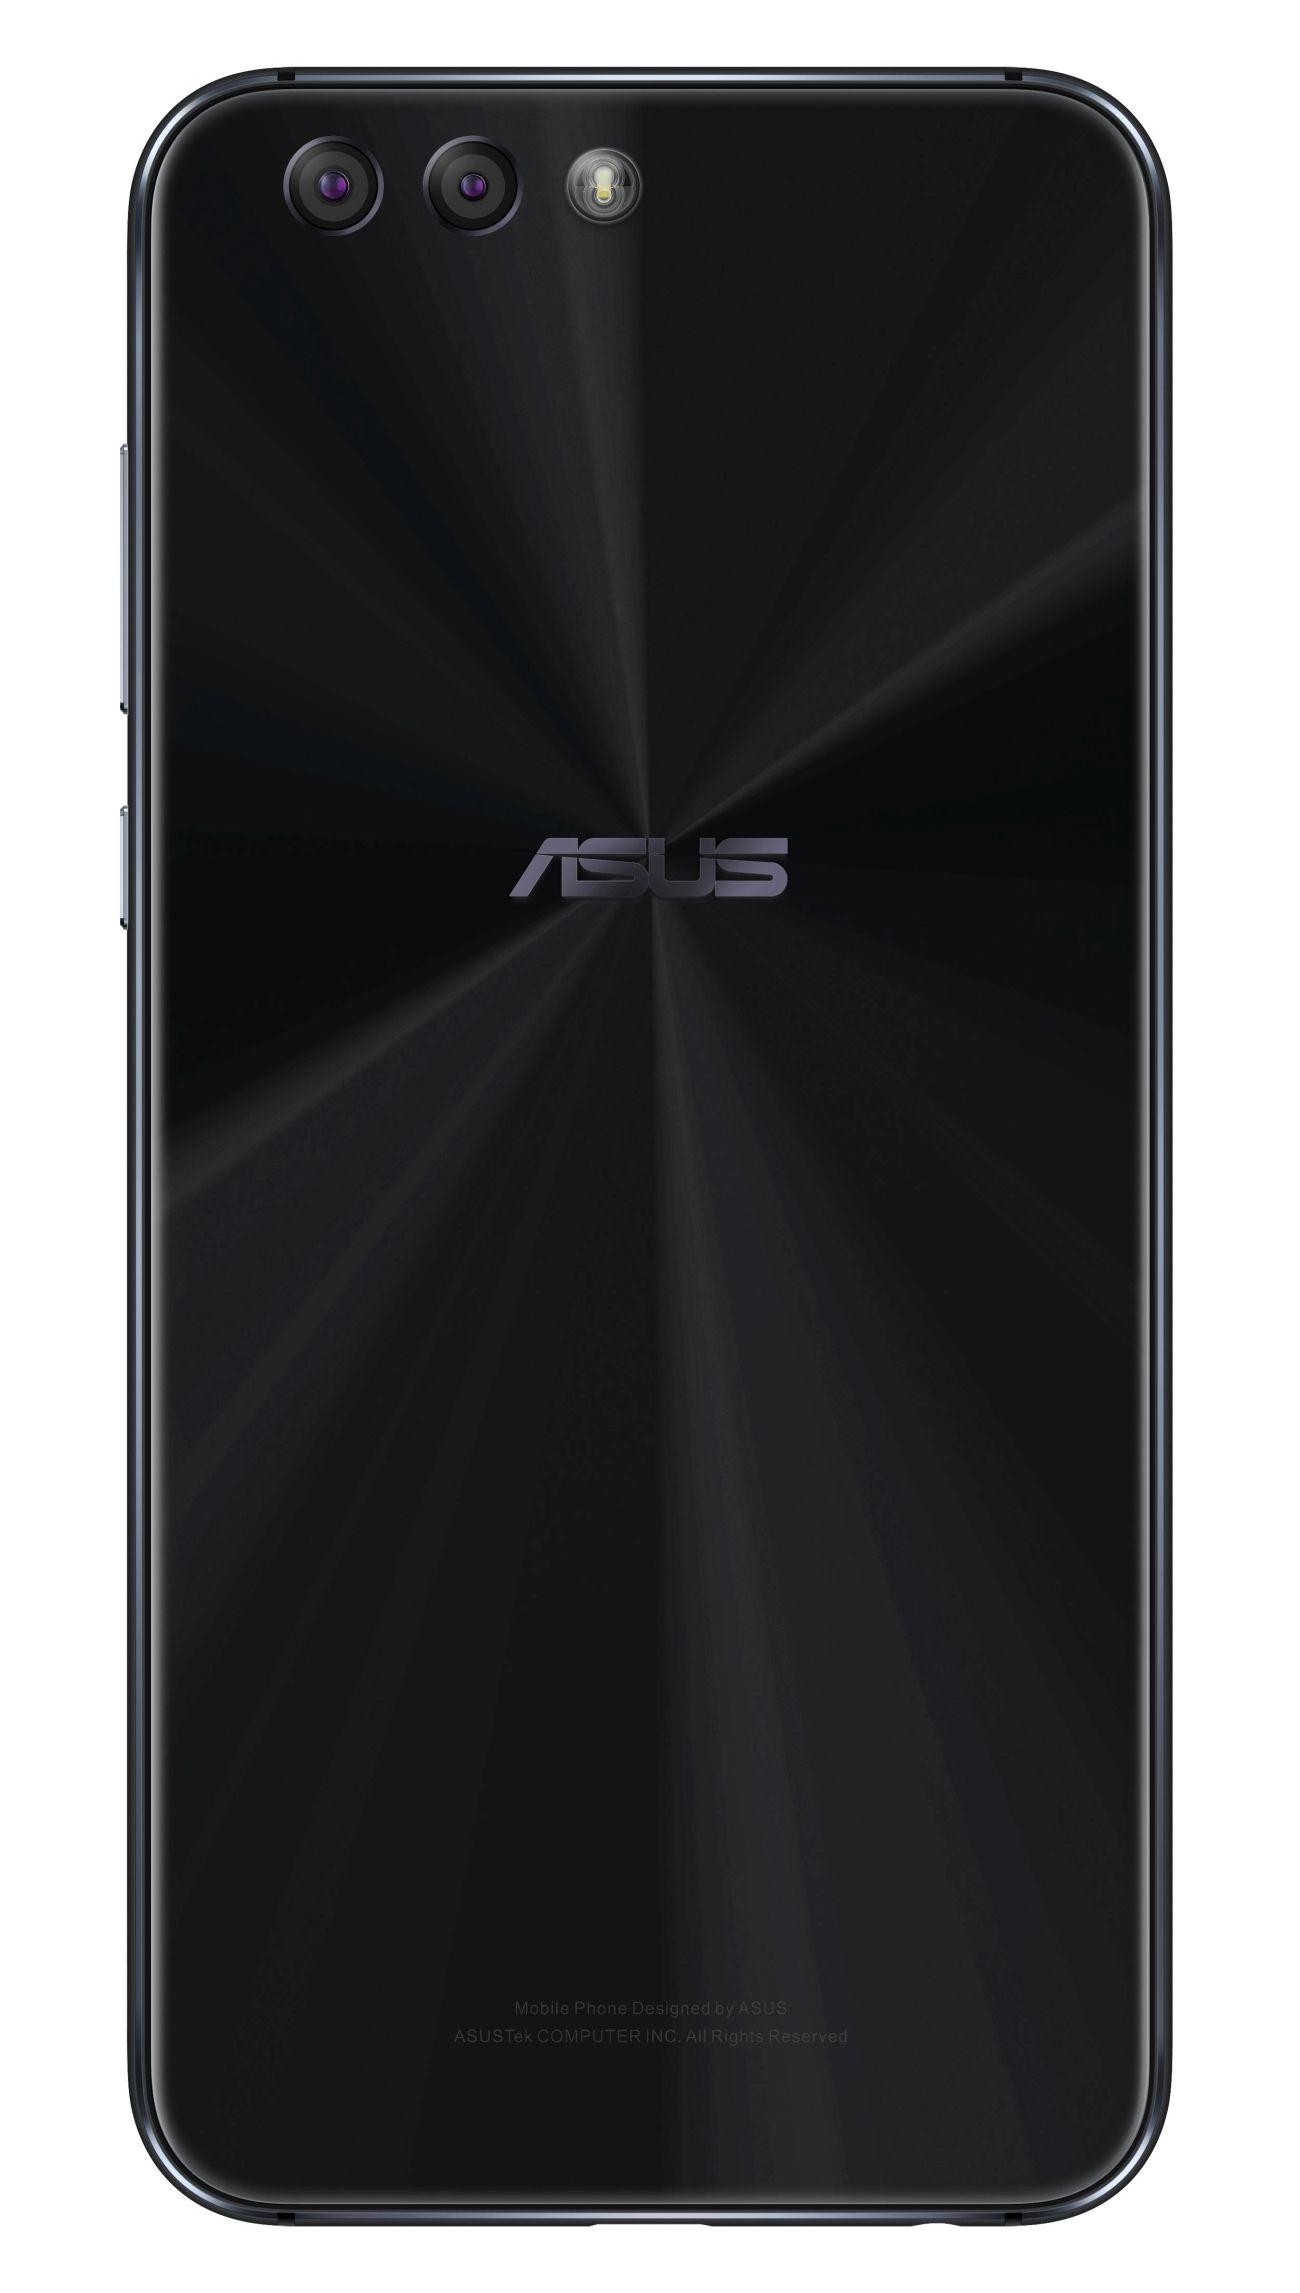 ZenFone 4_ZE554KL_Product Photo_Midnight Black_02 copy